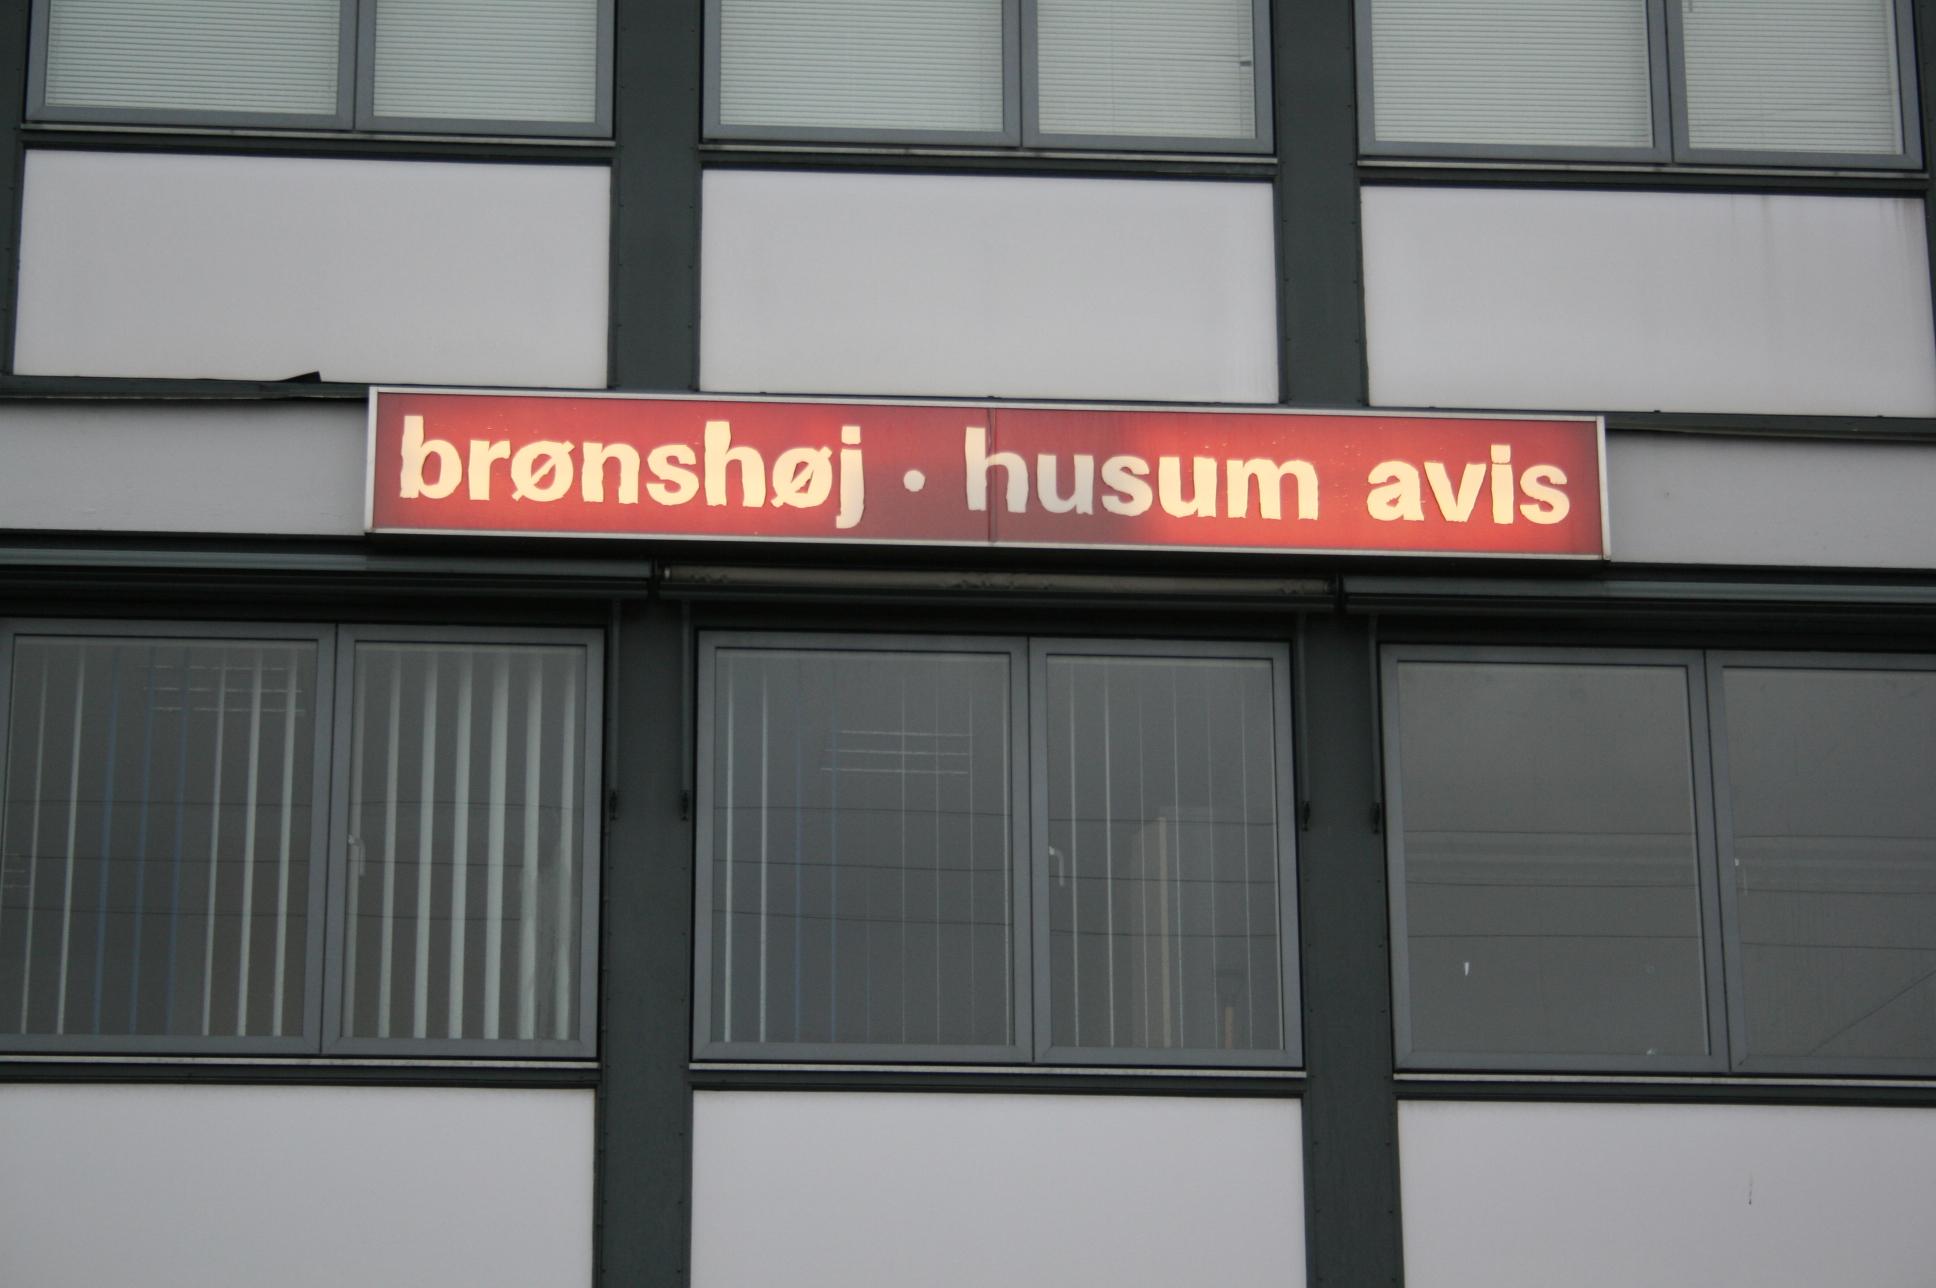 brønshøj husum avis